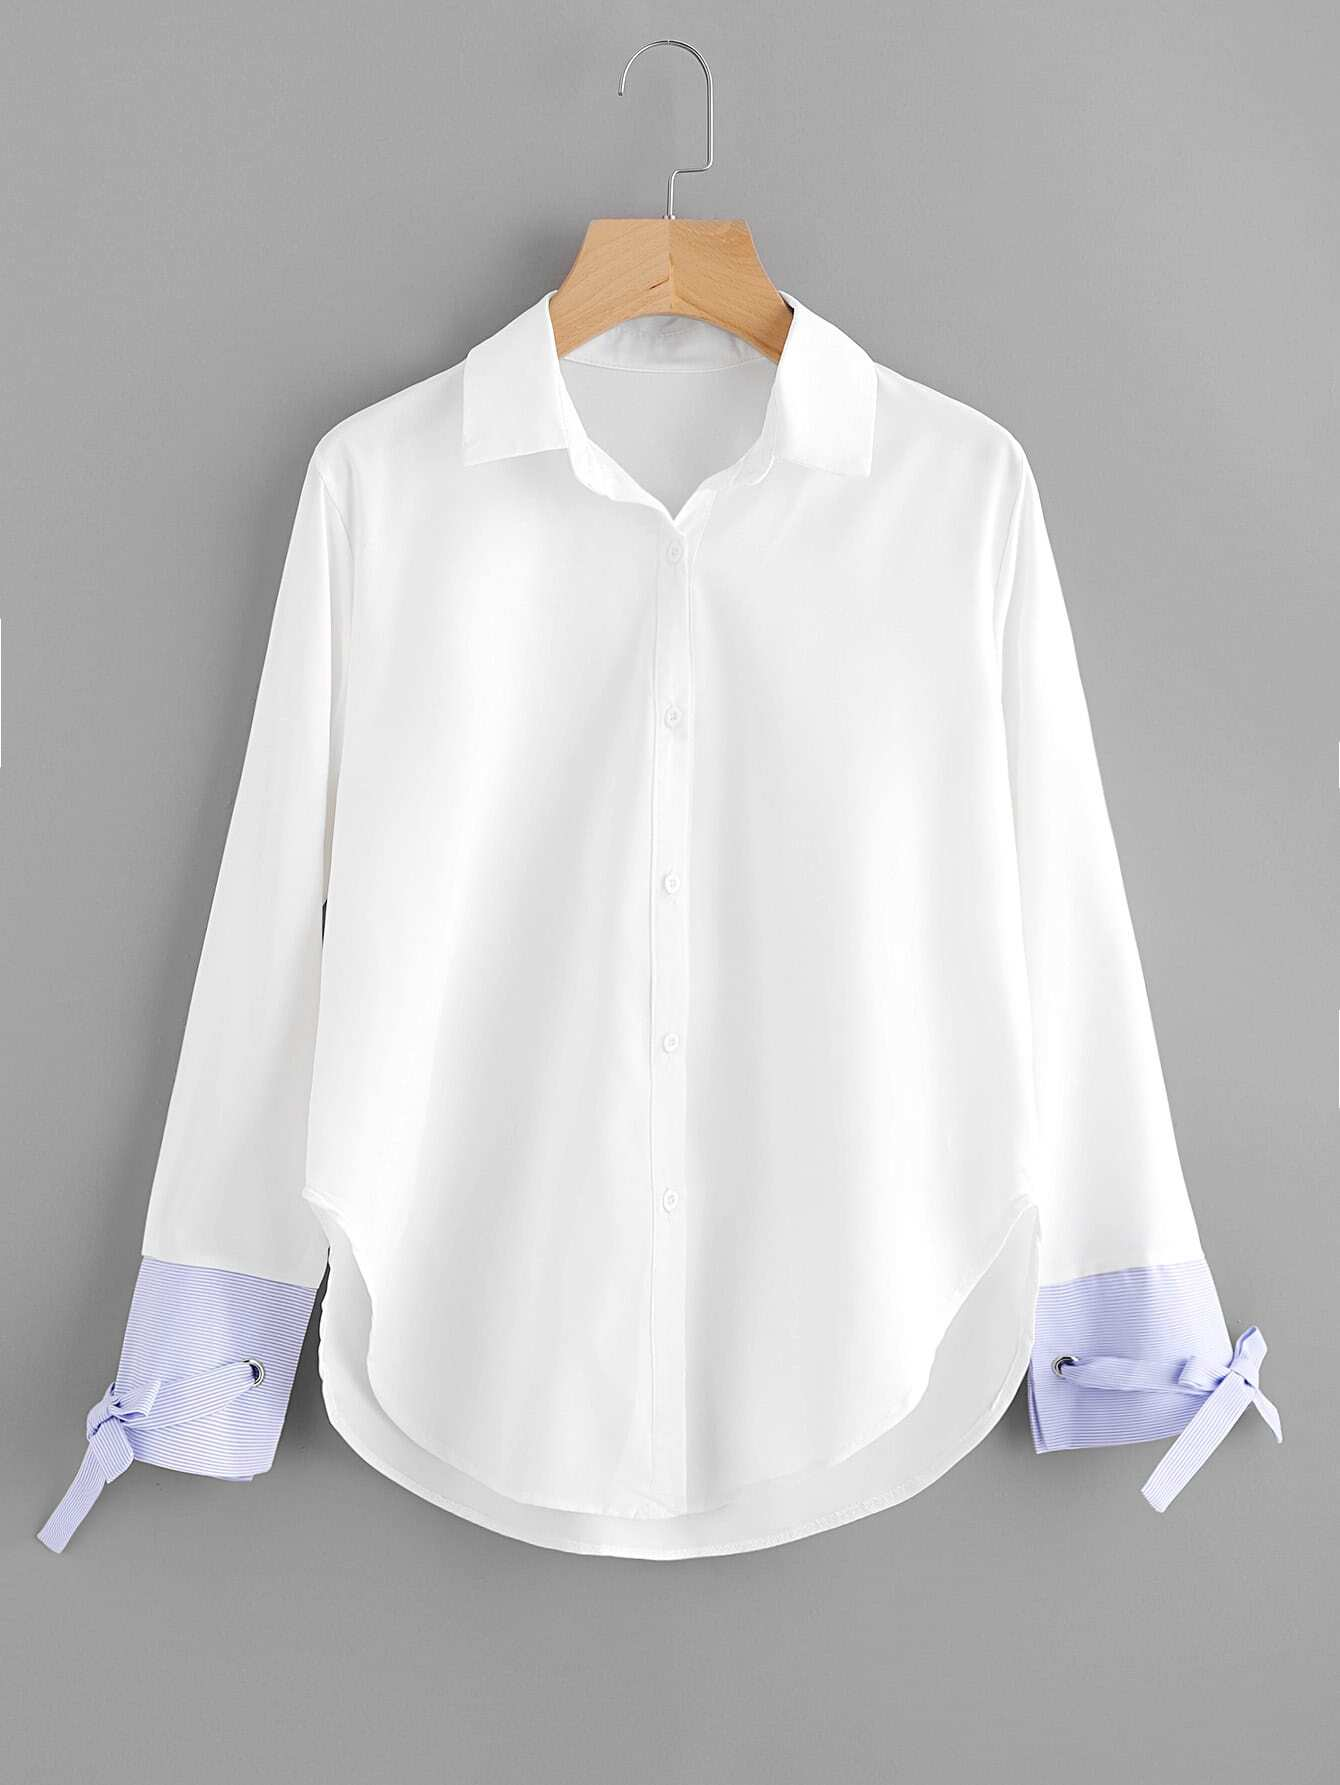 Contrast Striped Cuff Tie Detail Curved Hem Shirt curved hem striped shirt dress